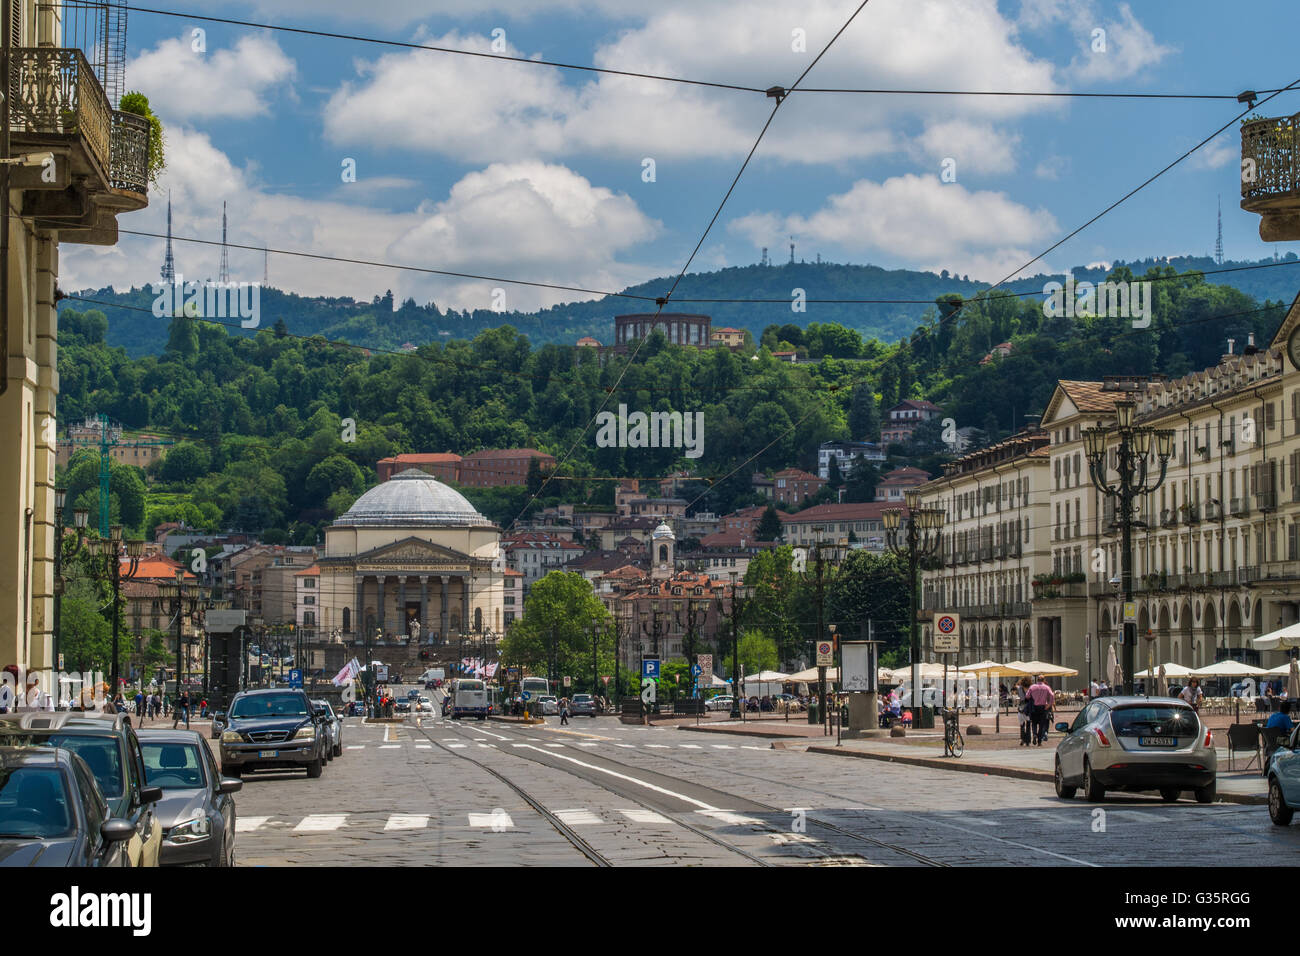 View towards the 'Gran Madre di Dio' church, Turin, Piedmont region, Italy. - Stock Image